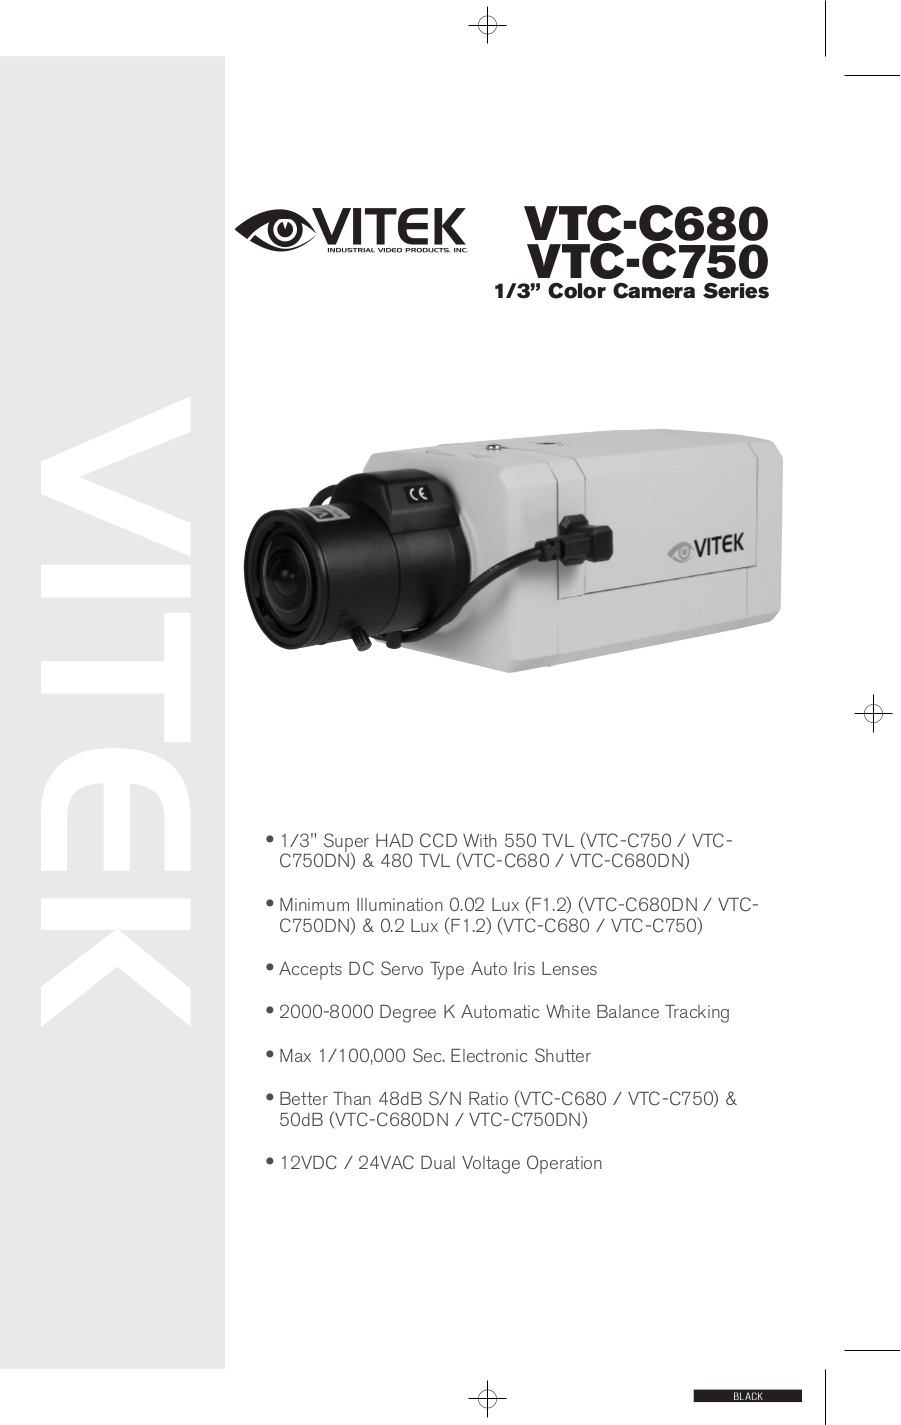 pdf for Vitek Security Camera VTC-C680 manual